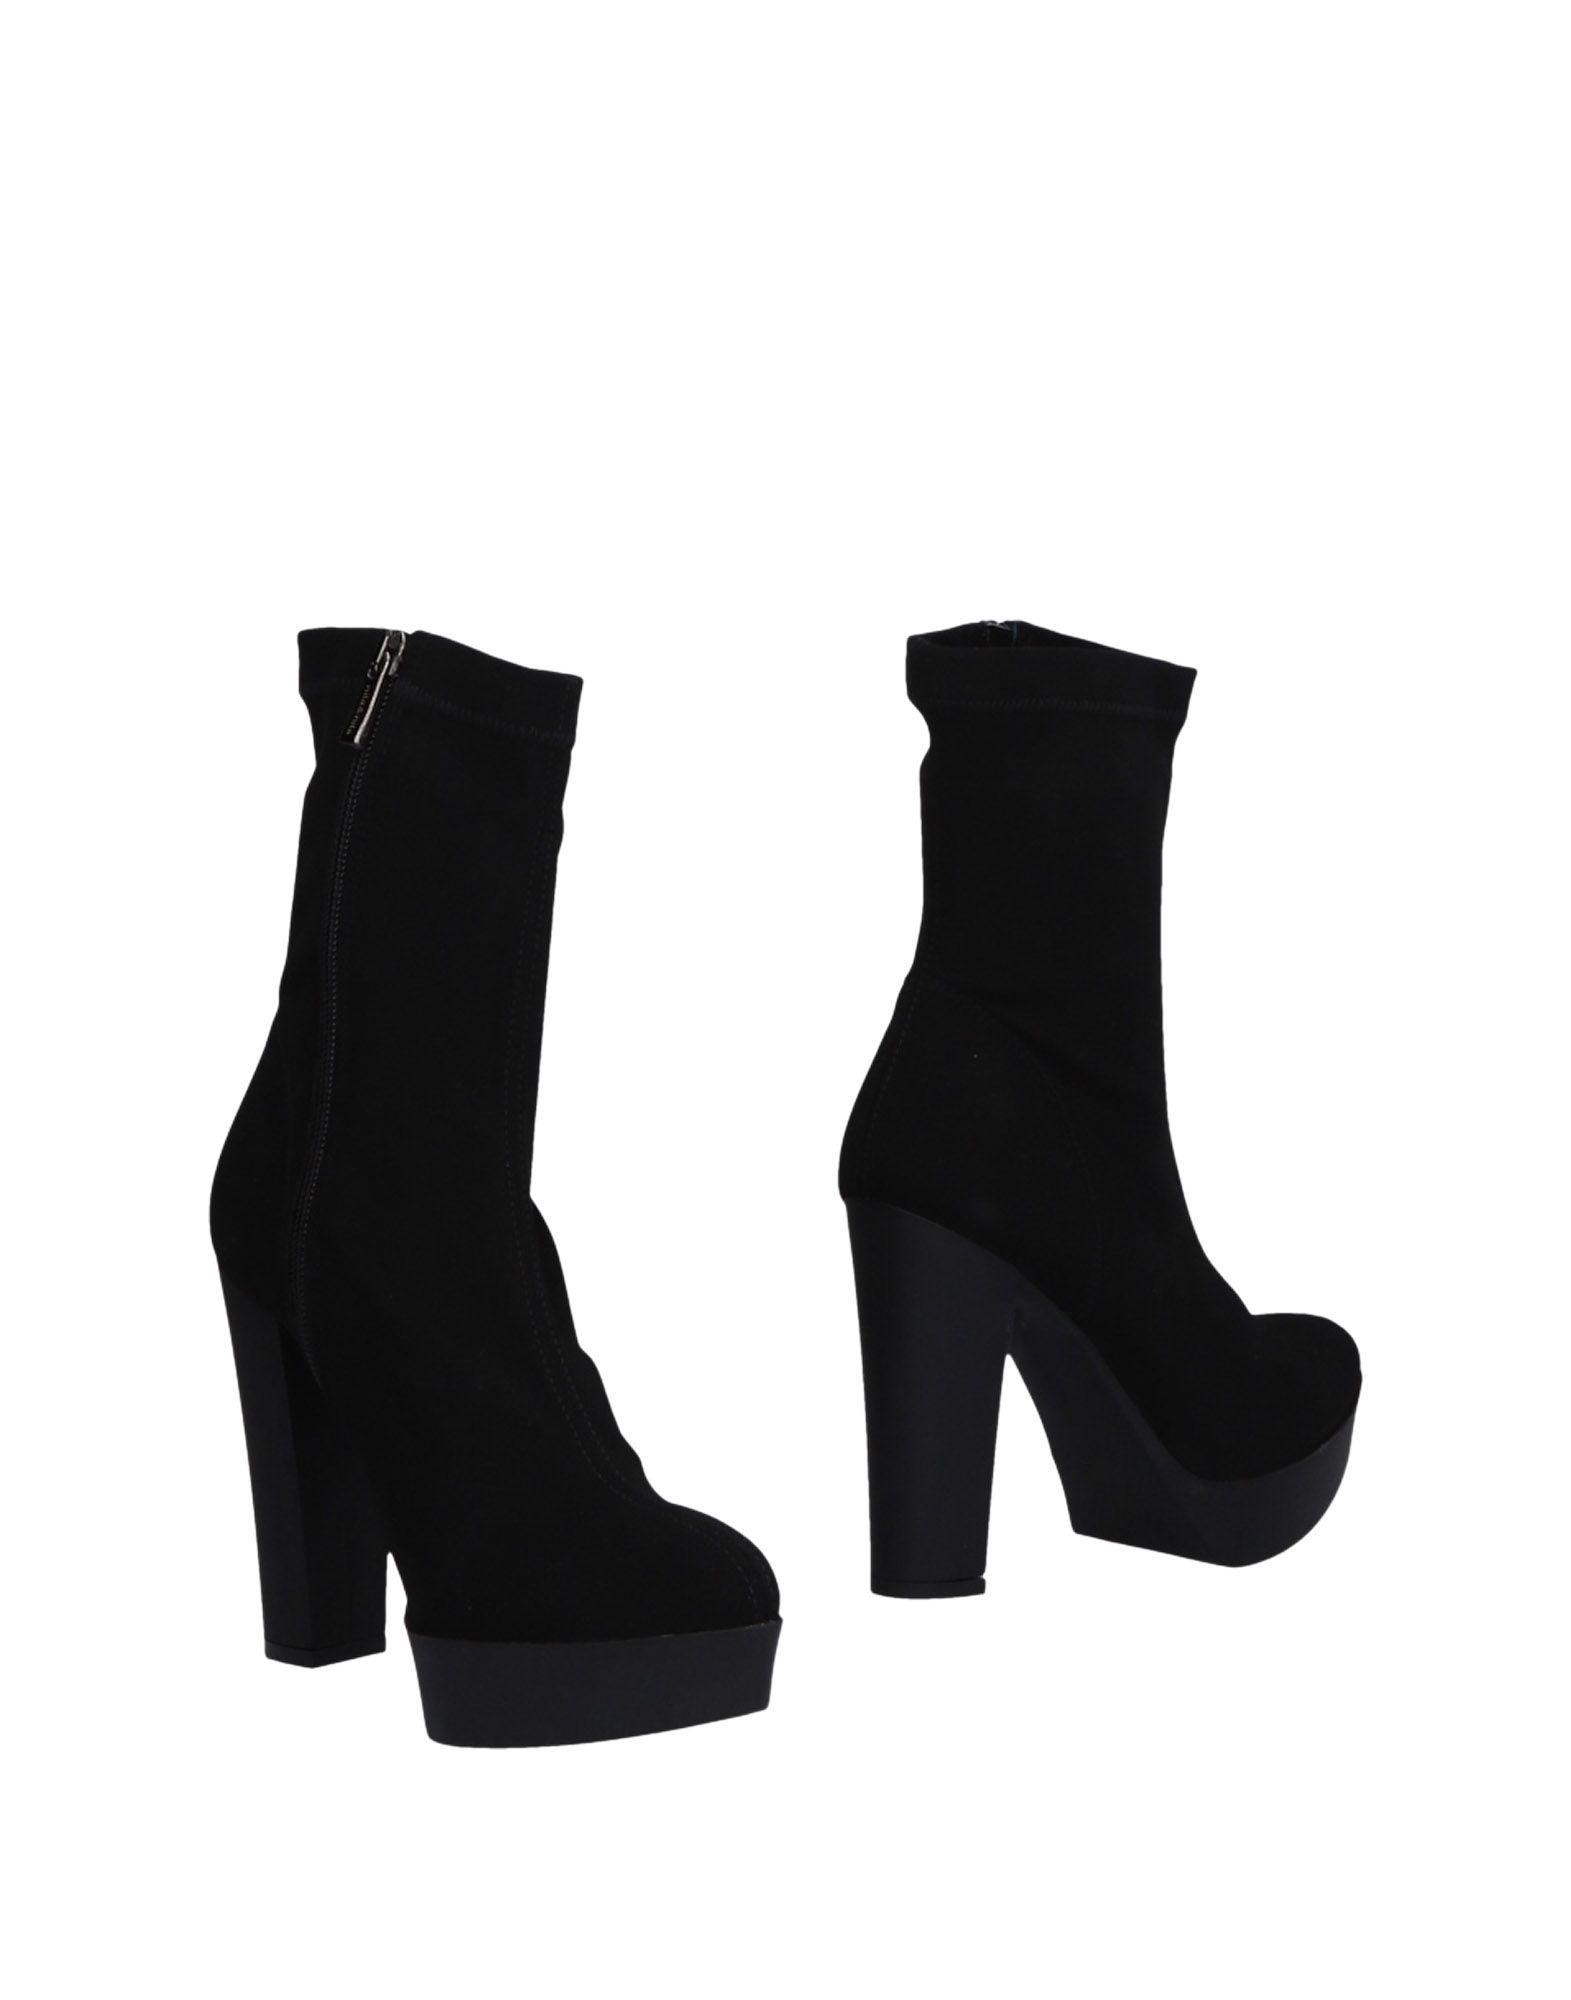 Bottine Nila & Nila Femme - Bottines Nila & Nila Noir Confortable et belle